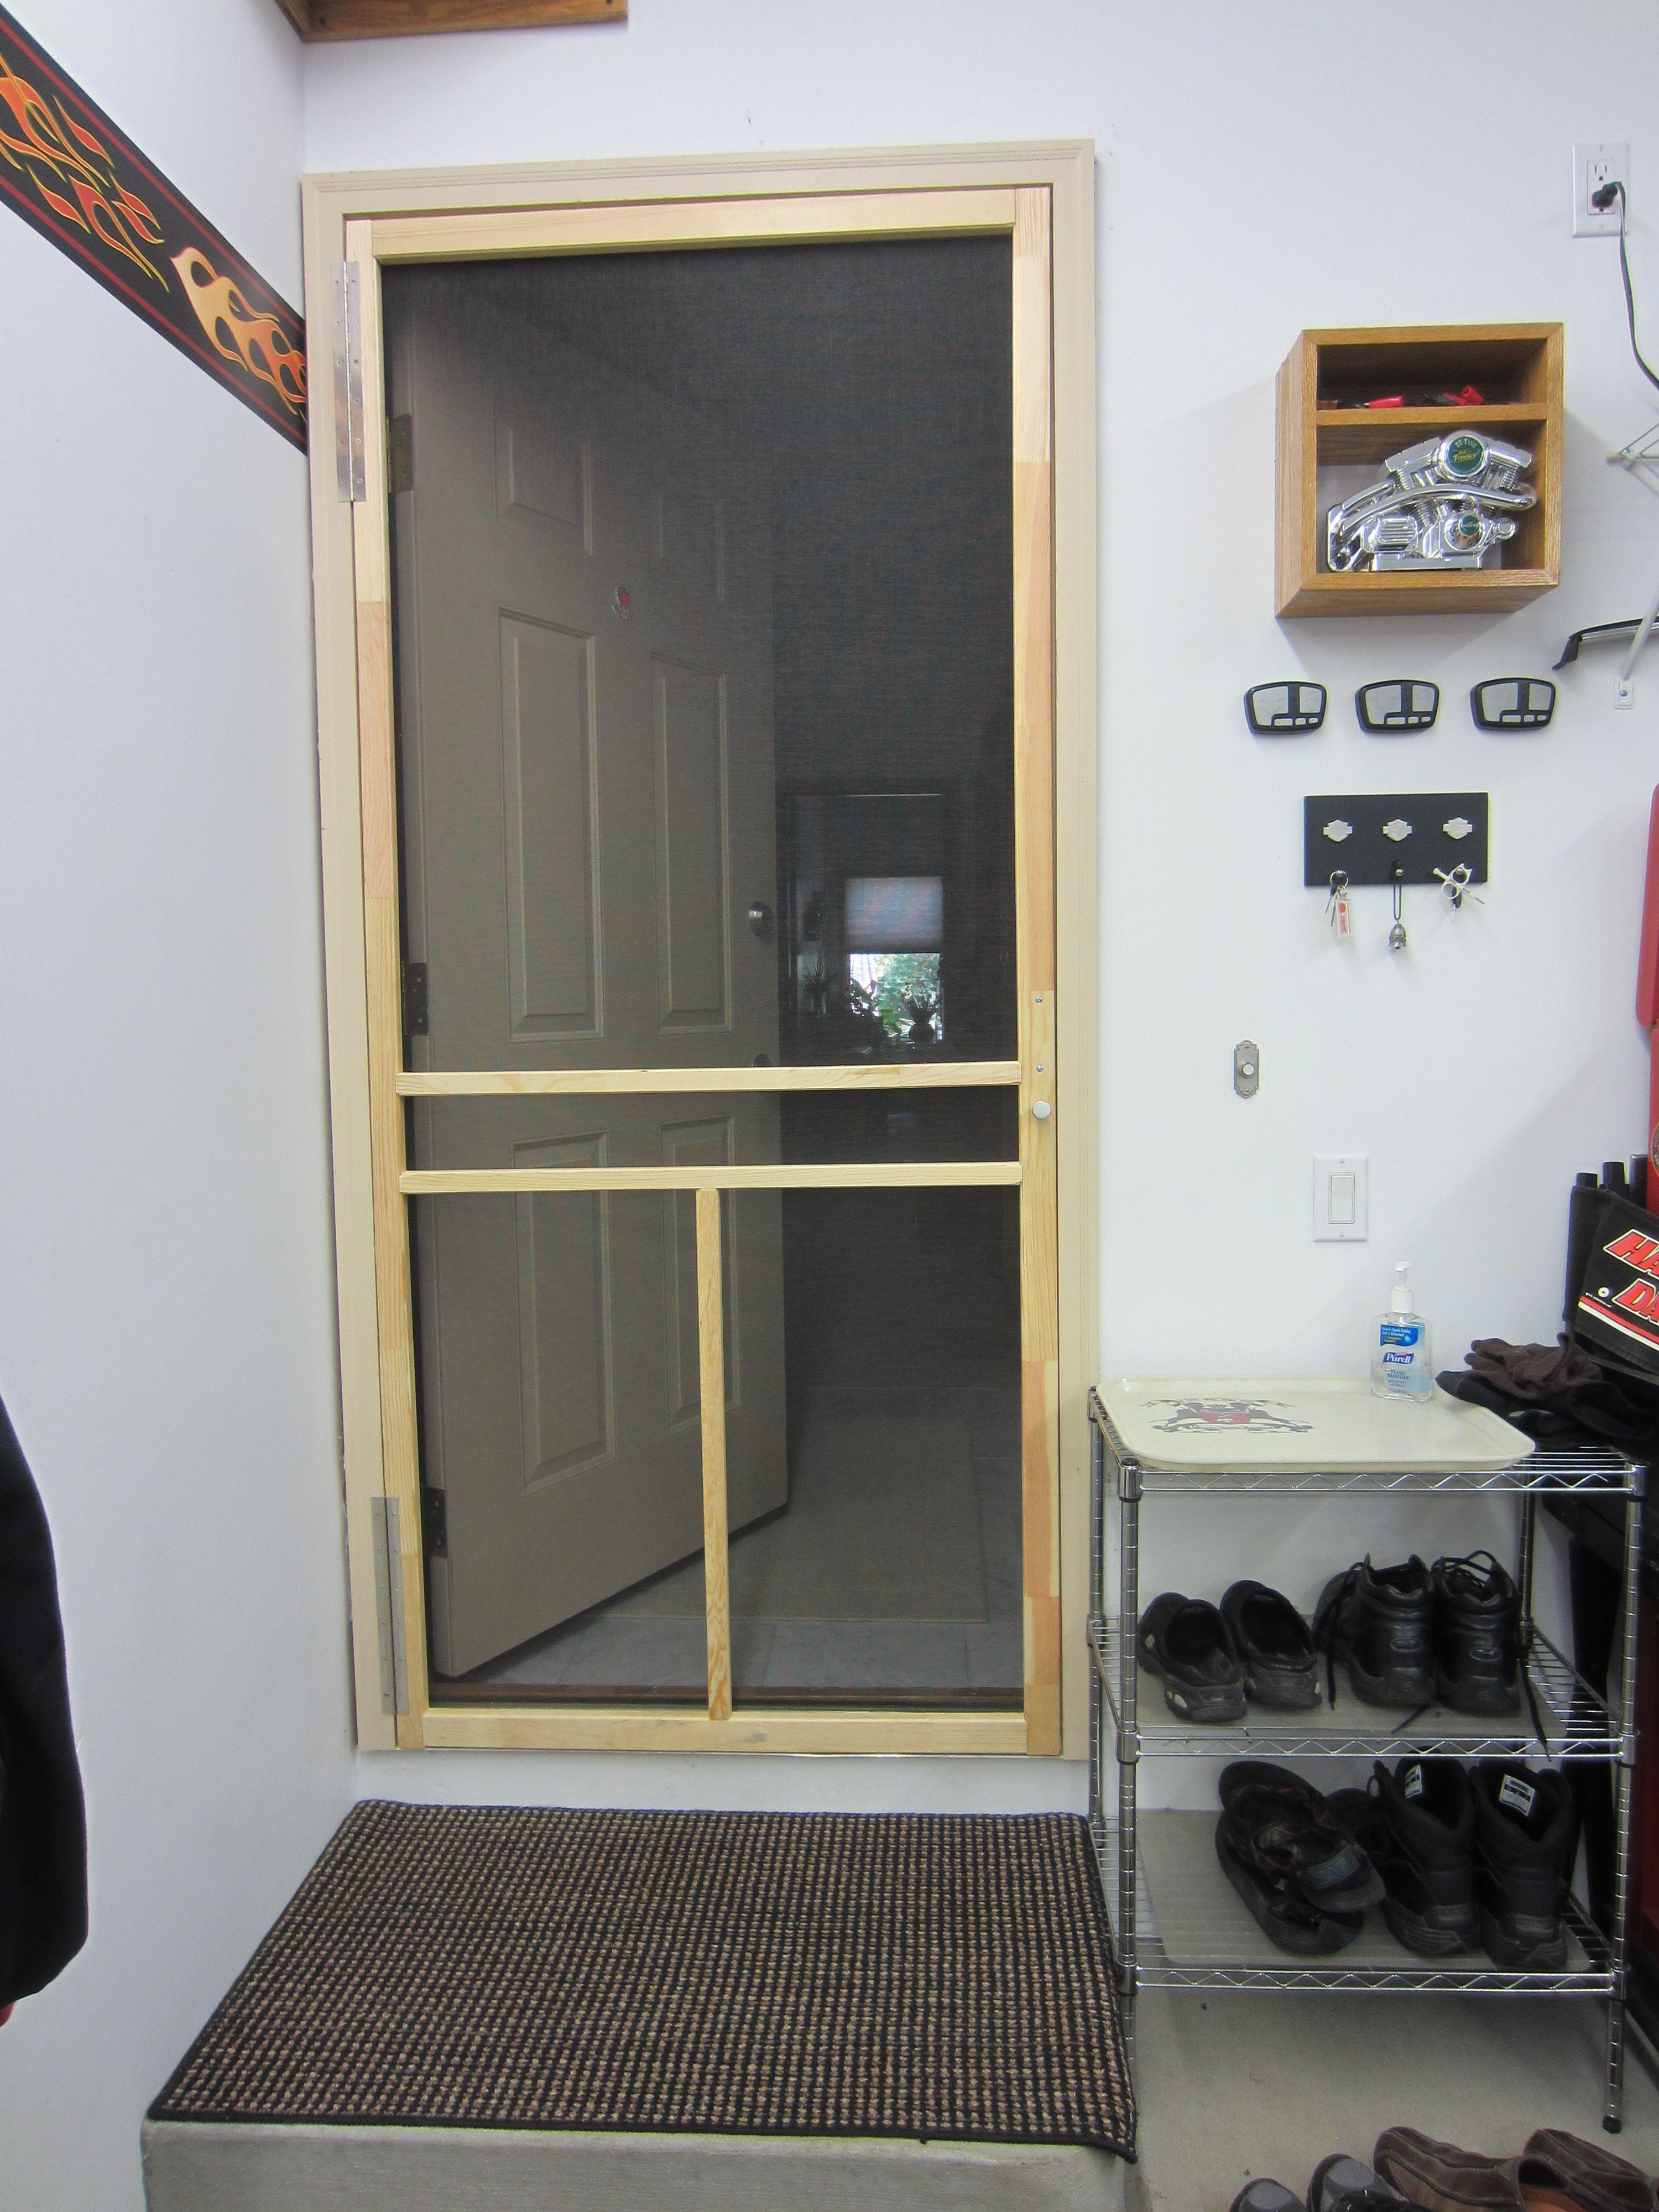 Screen Door Between House And Garage Provides Energy Savings By